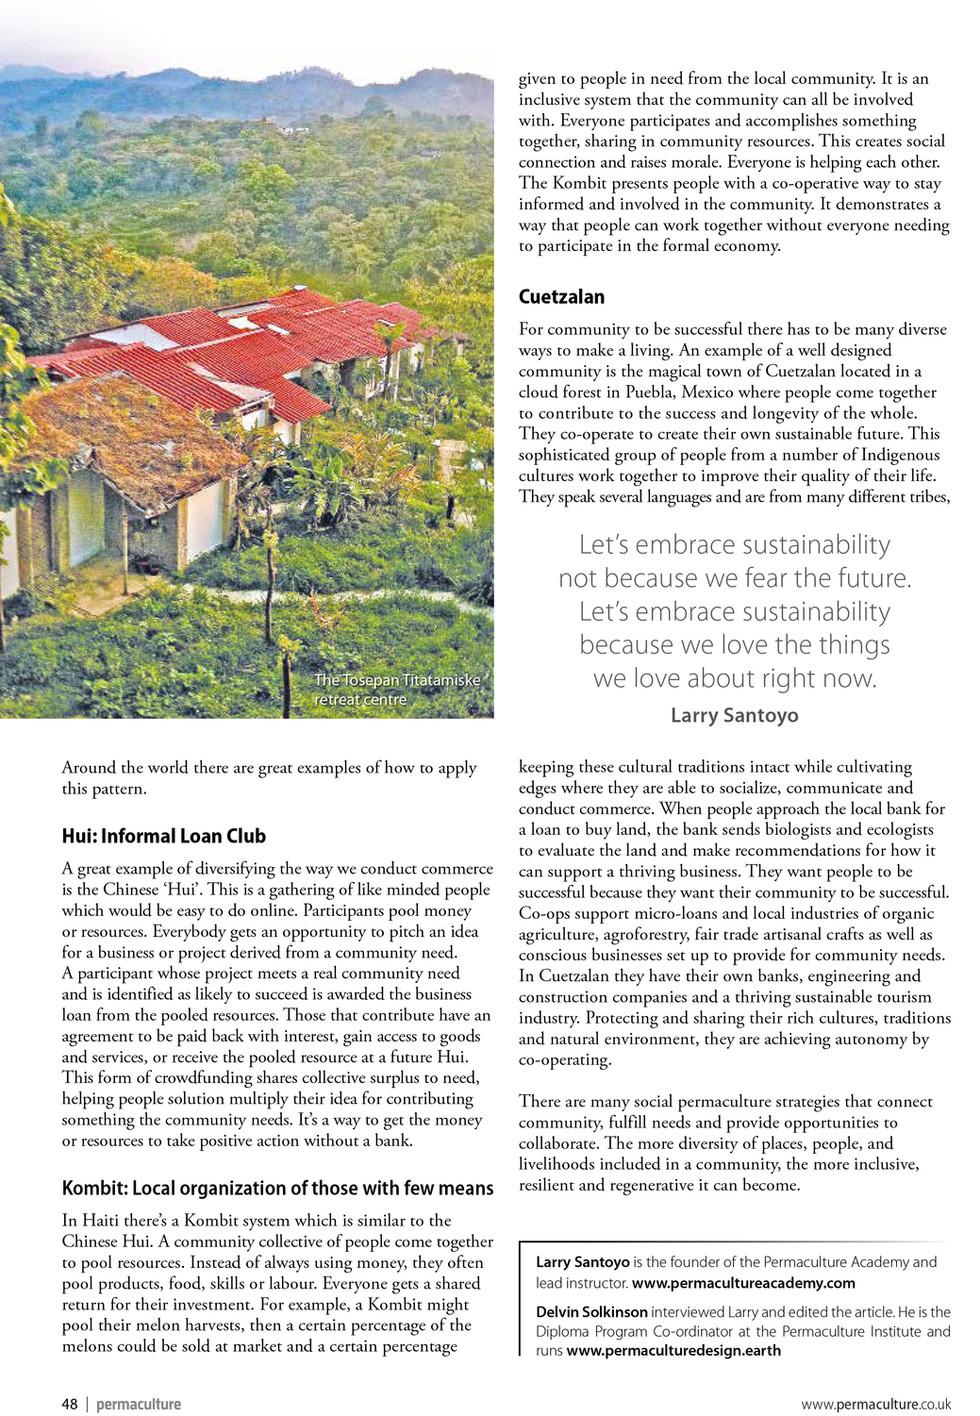 Delvin Solkinson, Permaculture Design, Permaculture Magazine, Larry Santoyo